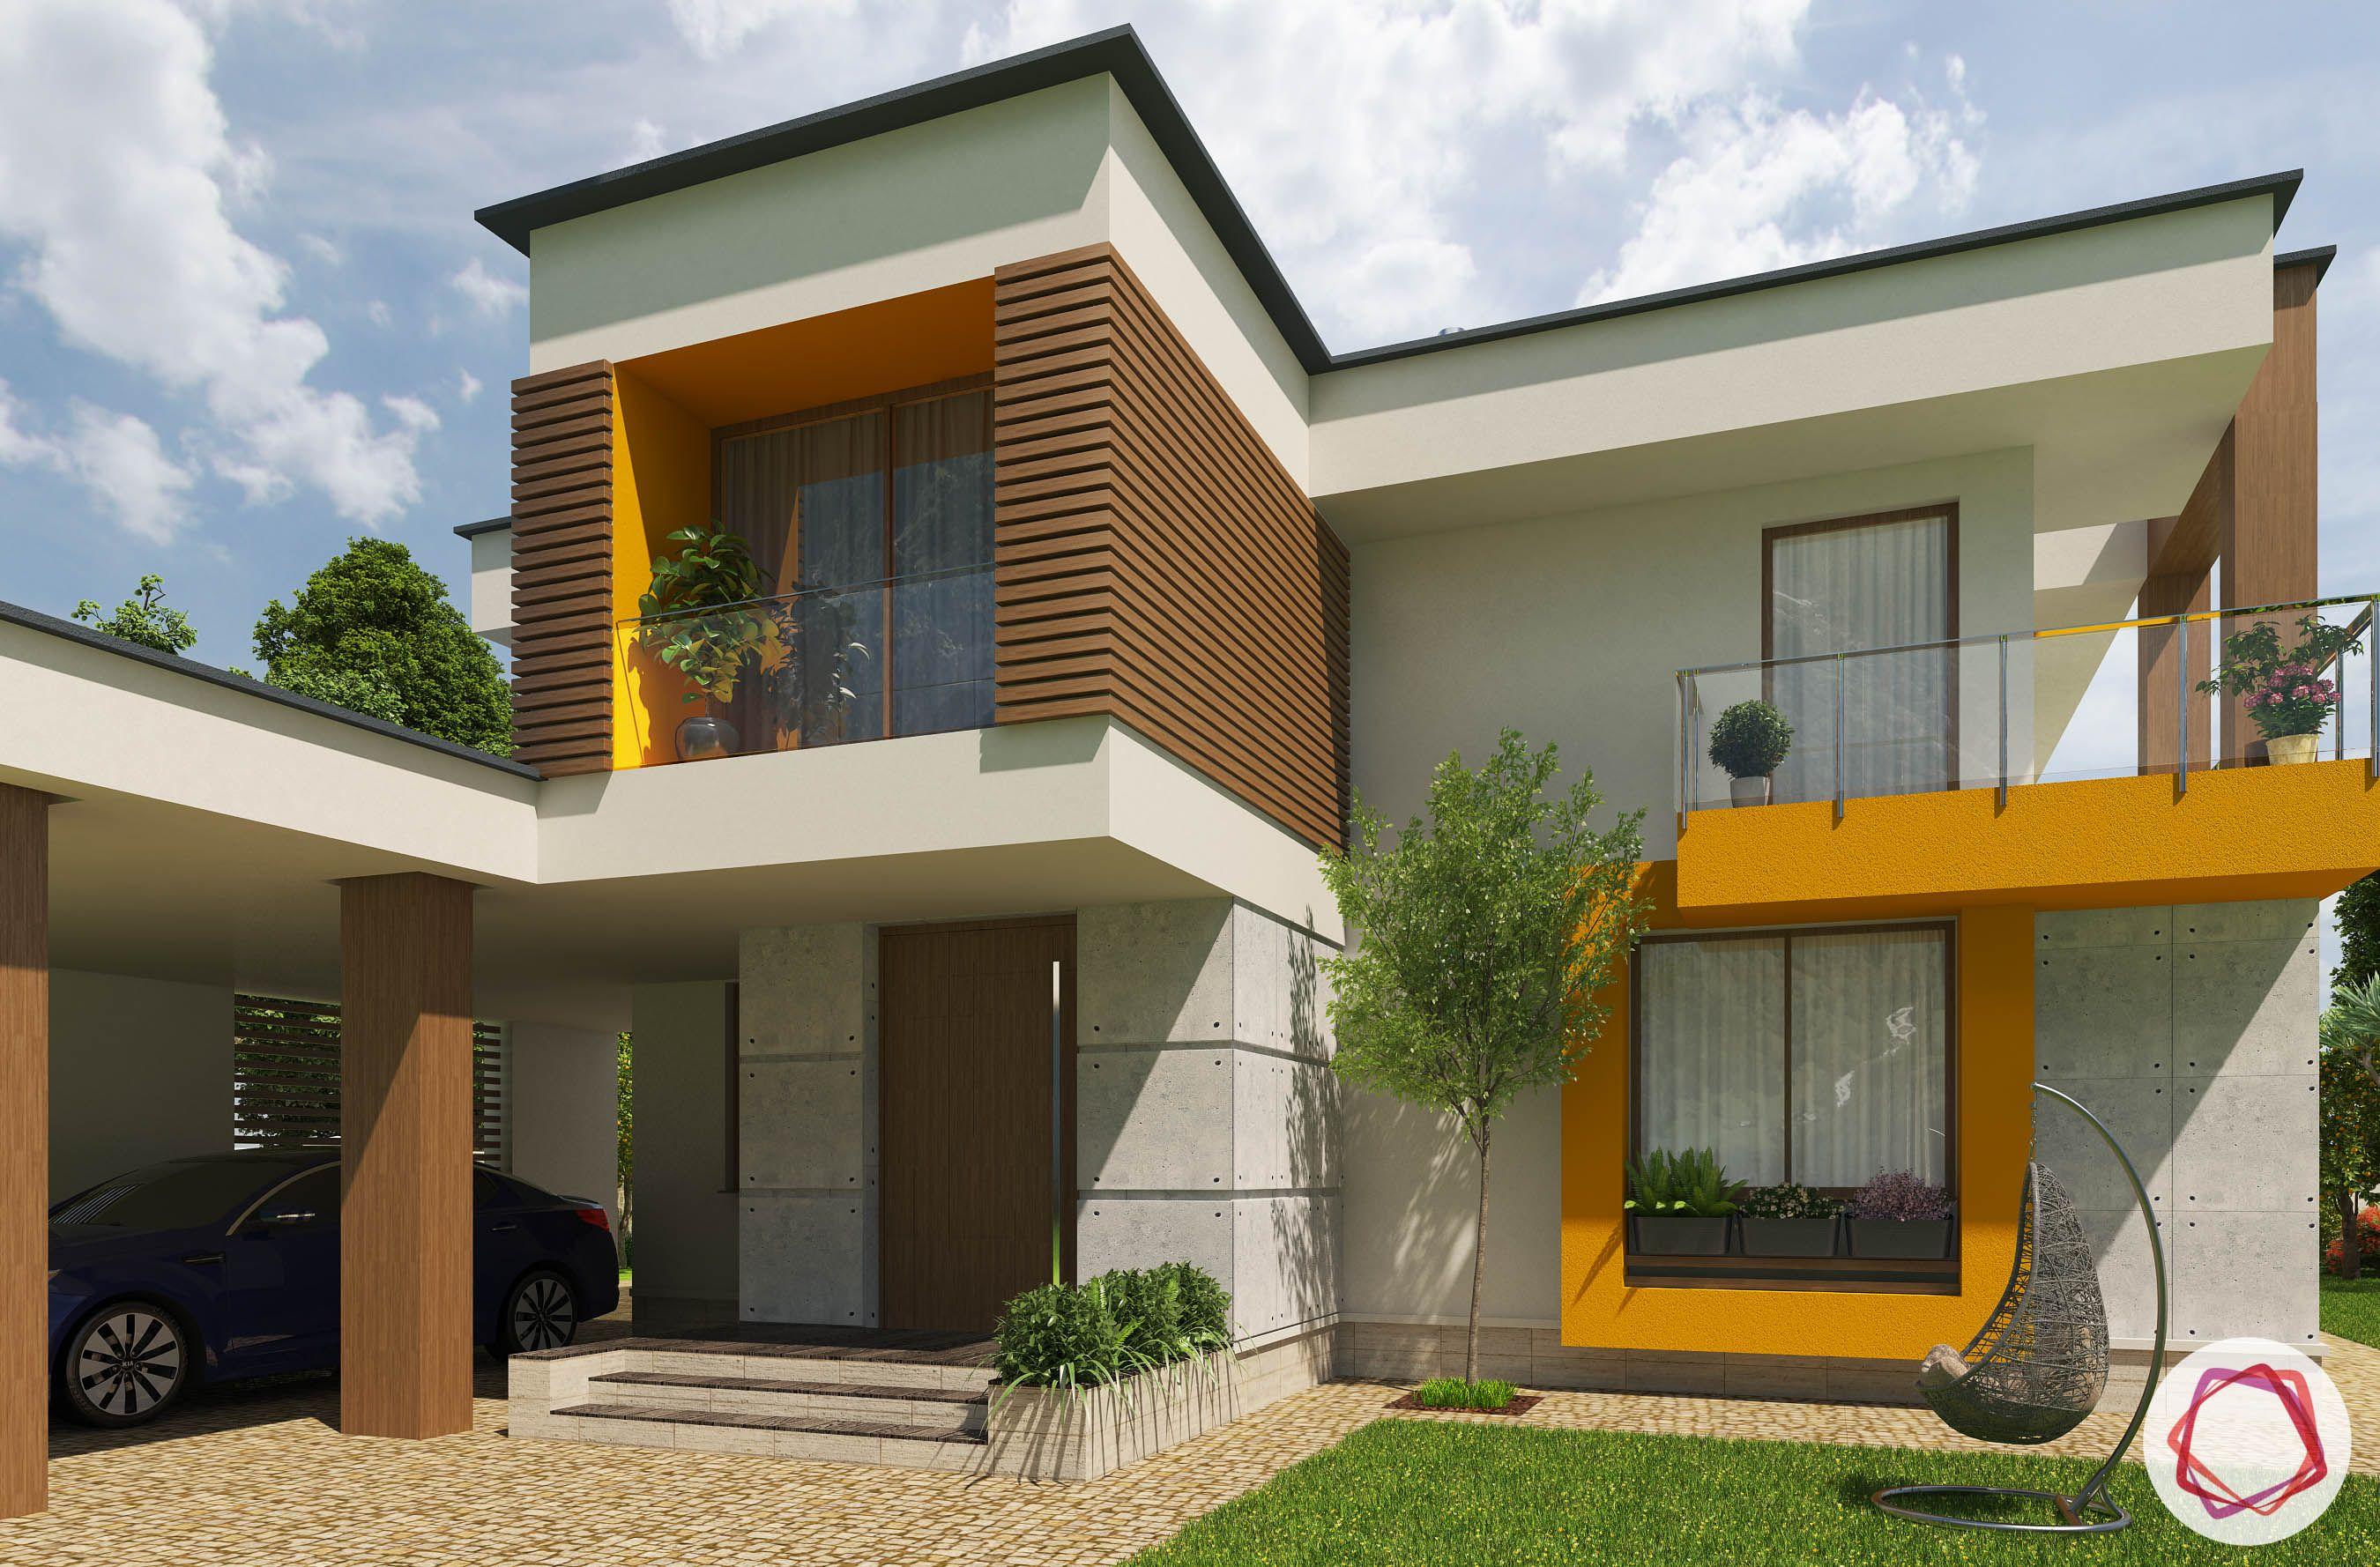 basic vastu for home-entrance-vastu compliant entrance-home exterior-bungalow-white and yellow house